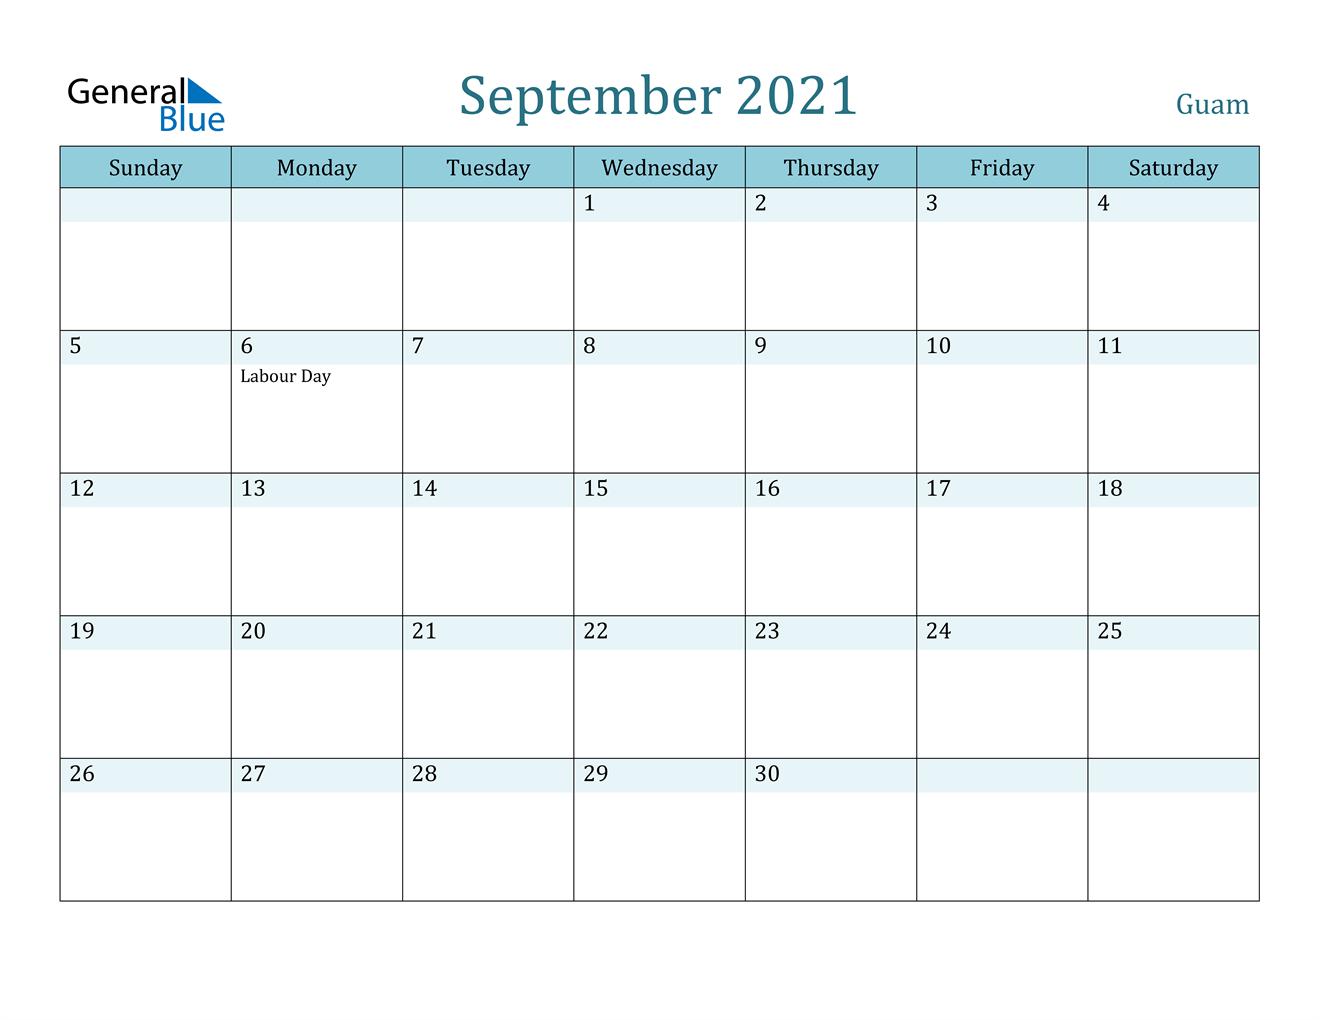 September 2021 Calendar - Guam